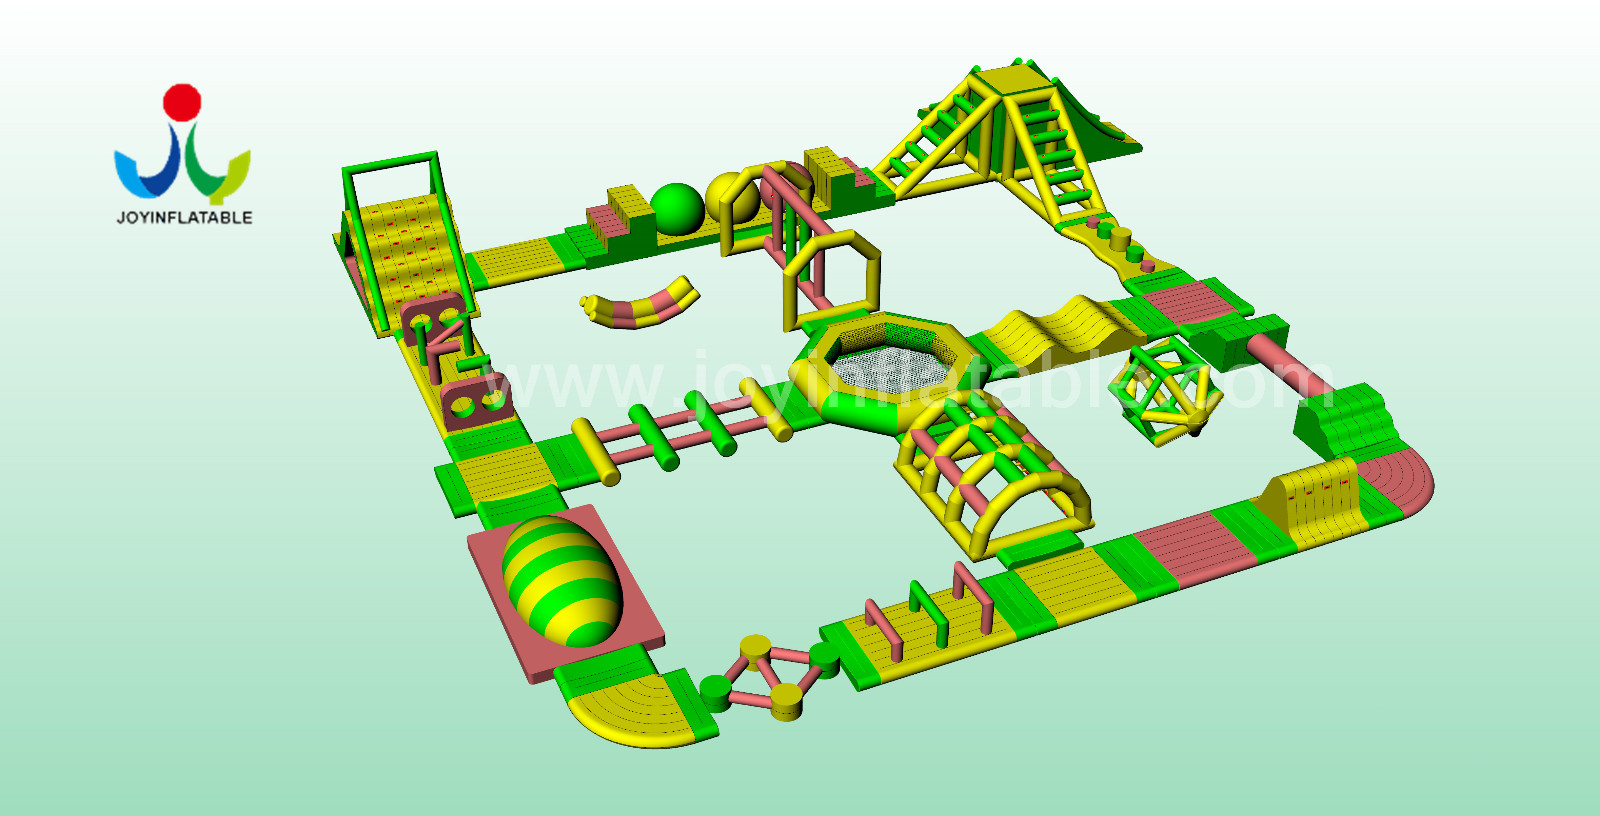 inflatable aqua park for child JOY inflatable-6